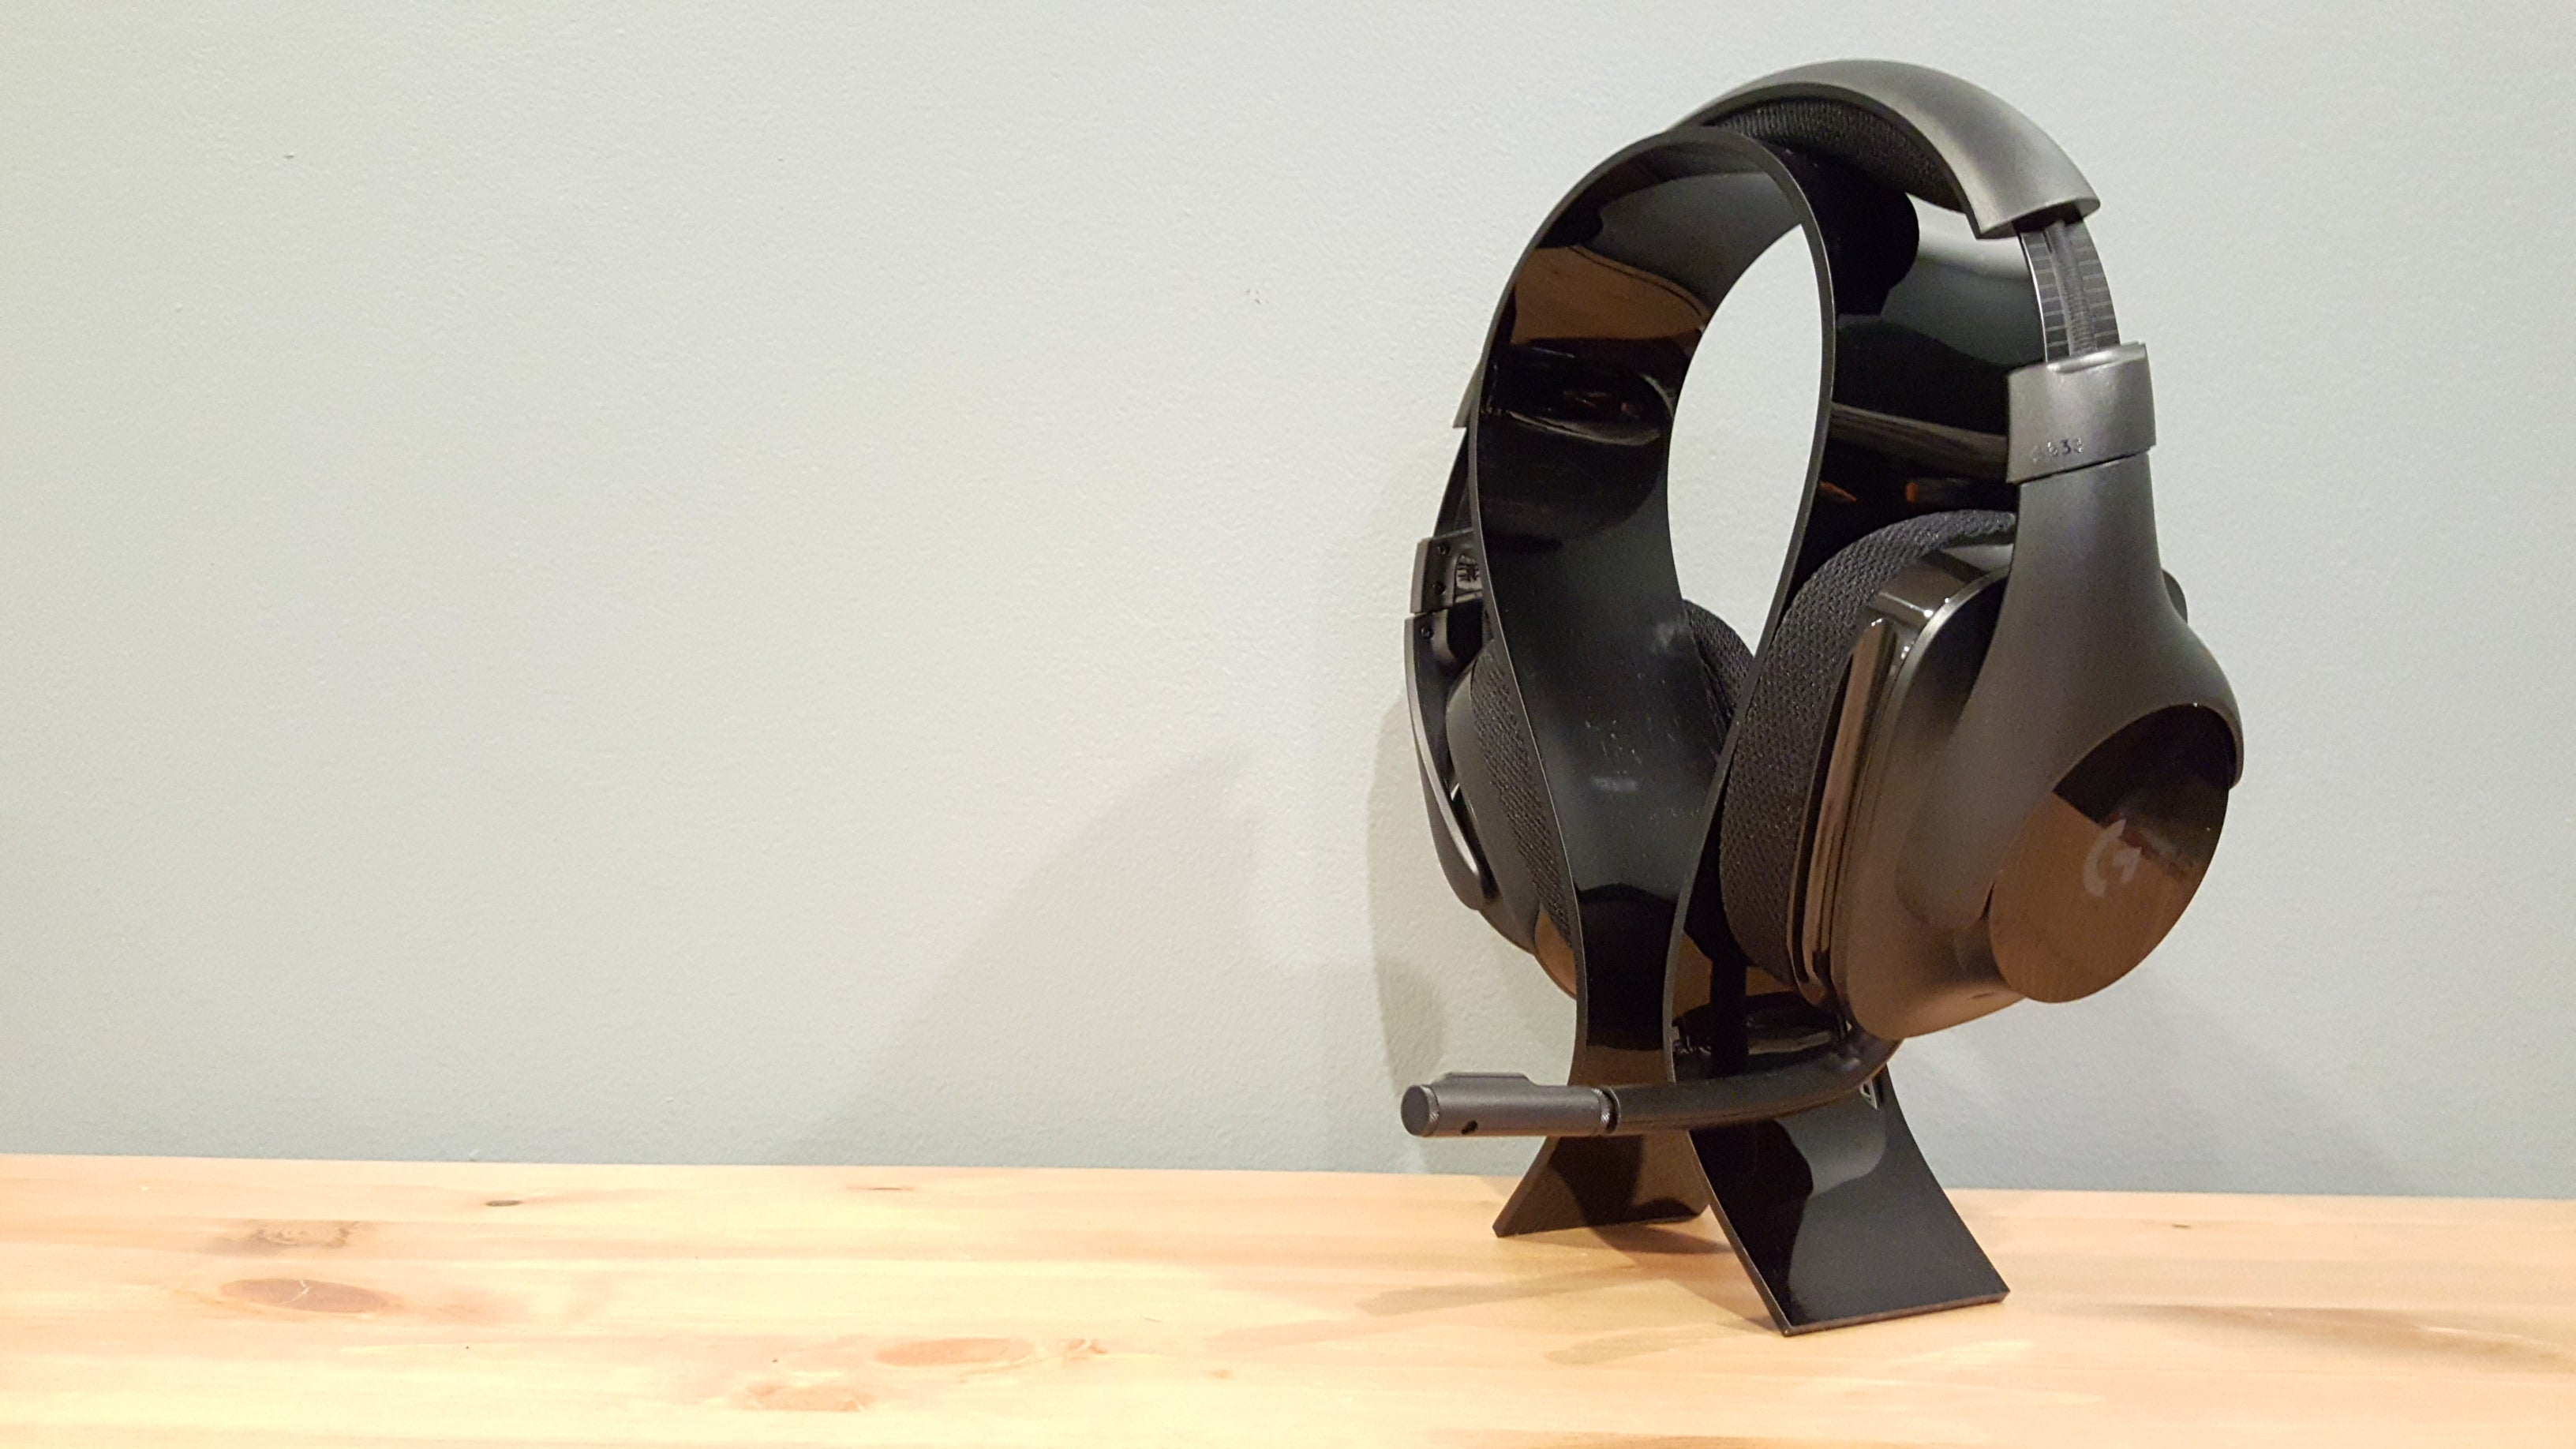 Logitech G533 Review An Excellent Wireless Headset That's